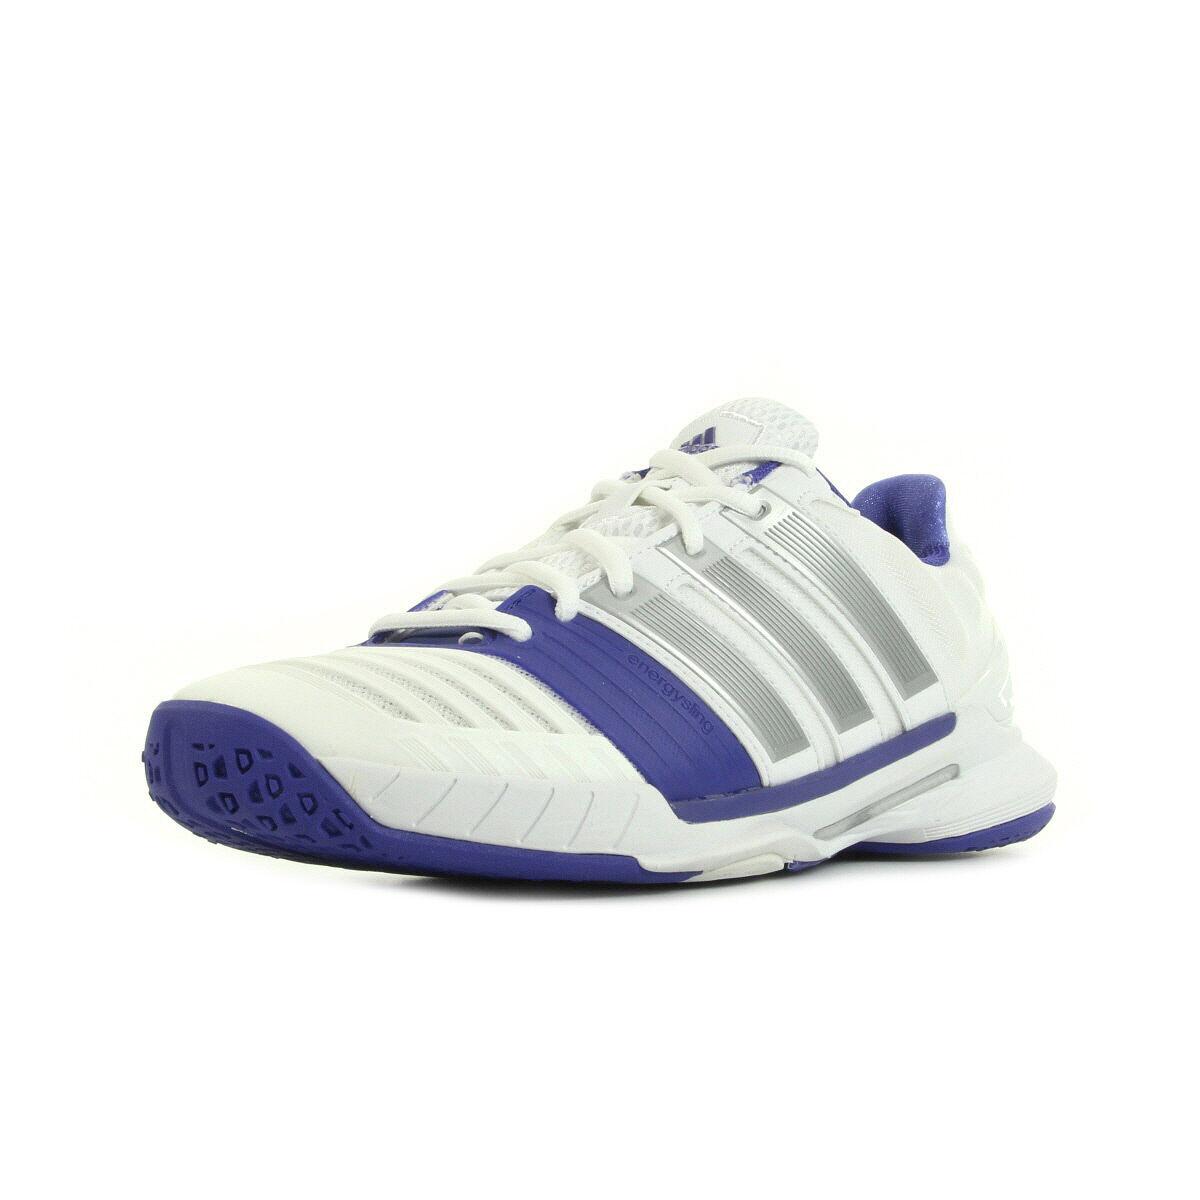 75%] Scarpe Indoor Adidas Adipower Stabil 11 (M17488)